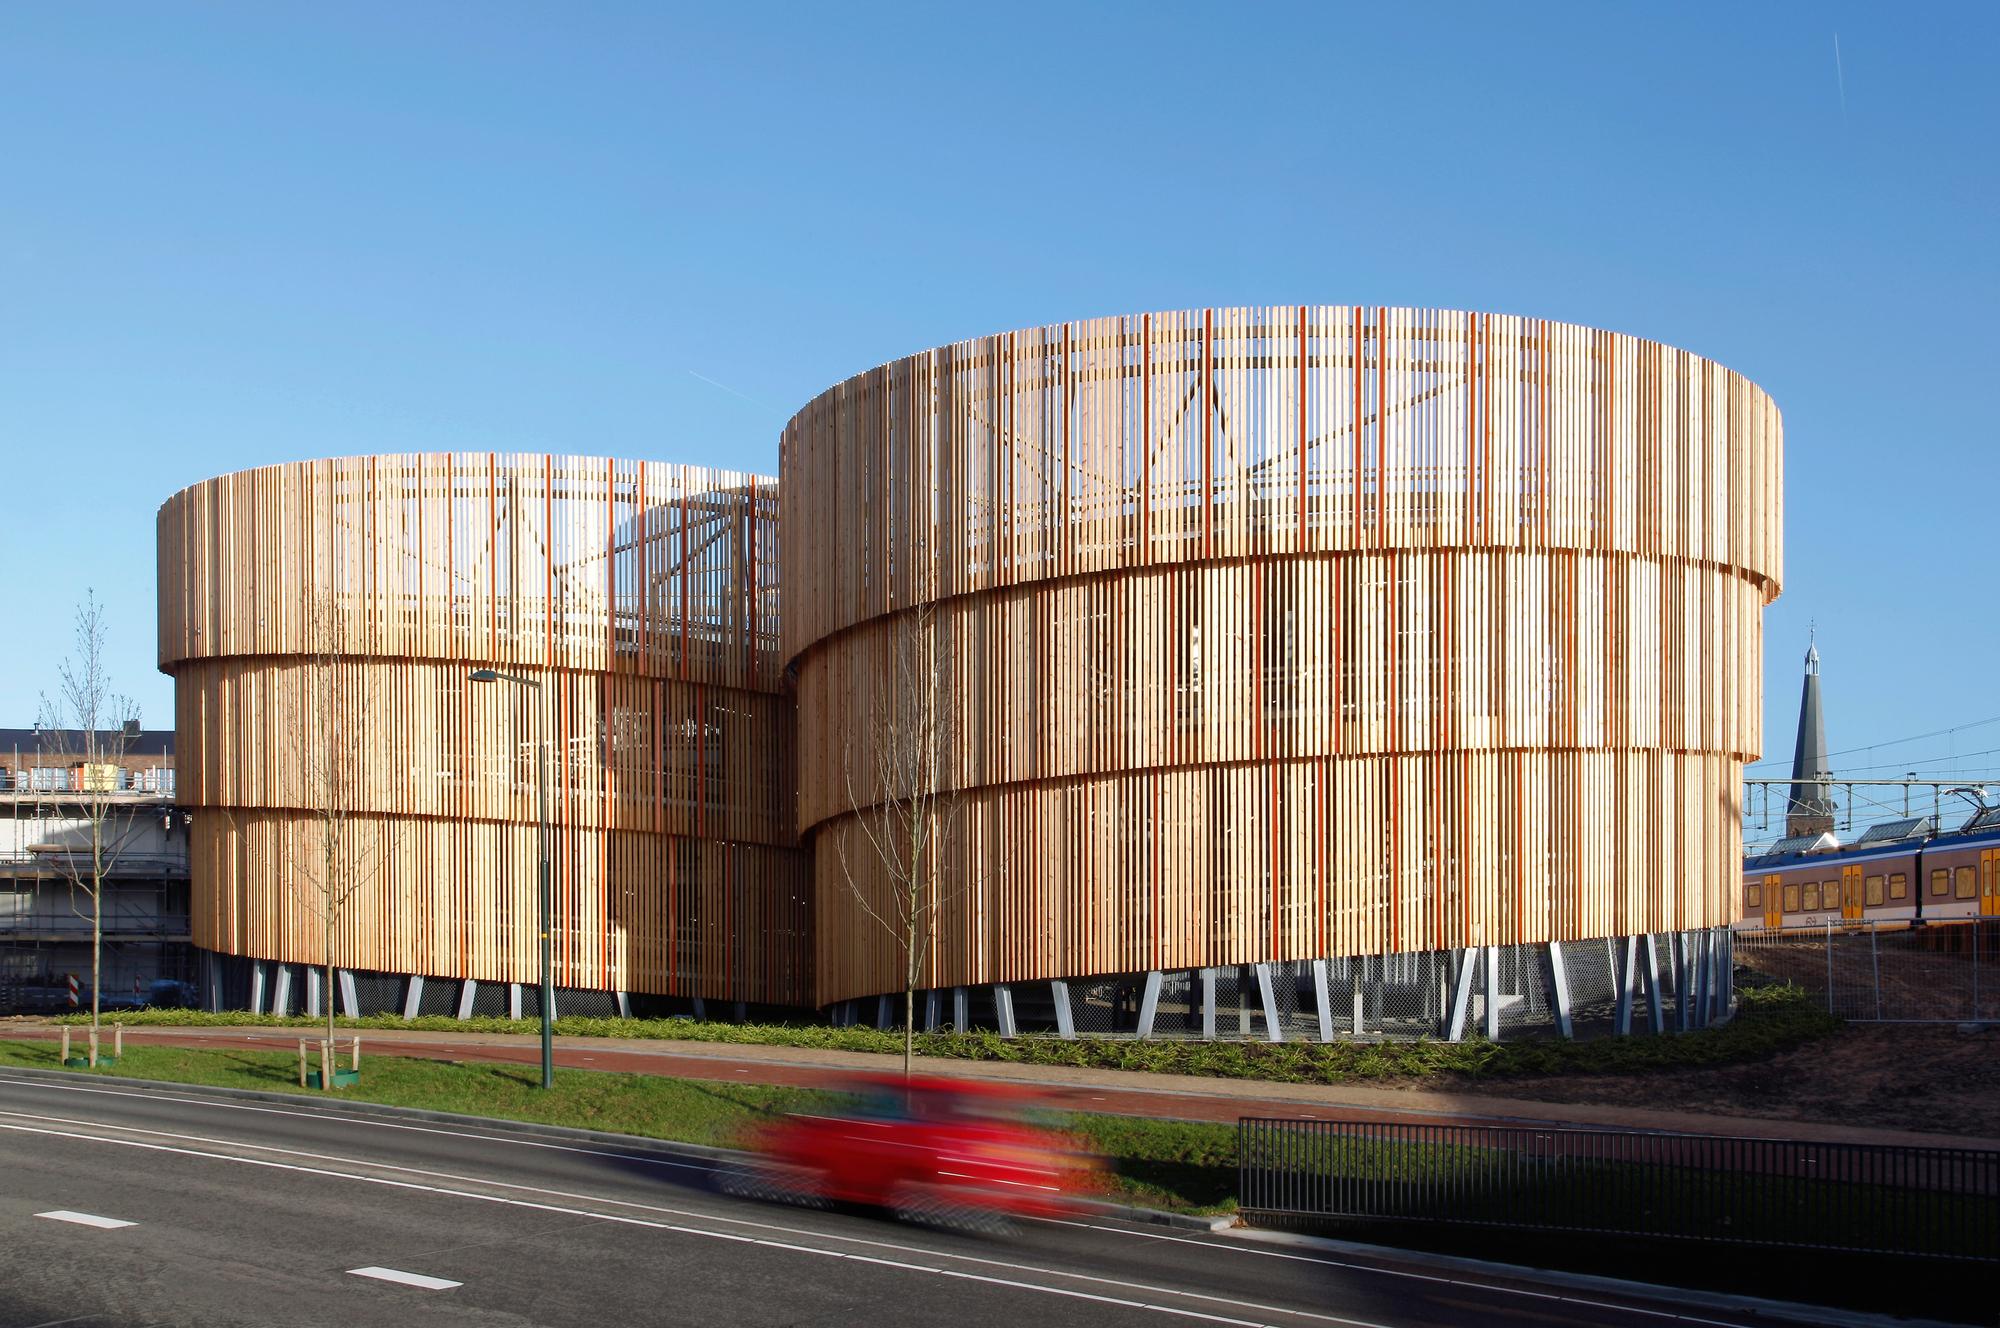 P R Car Park Zutphen Moederscheimmoonen Architects